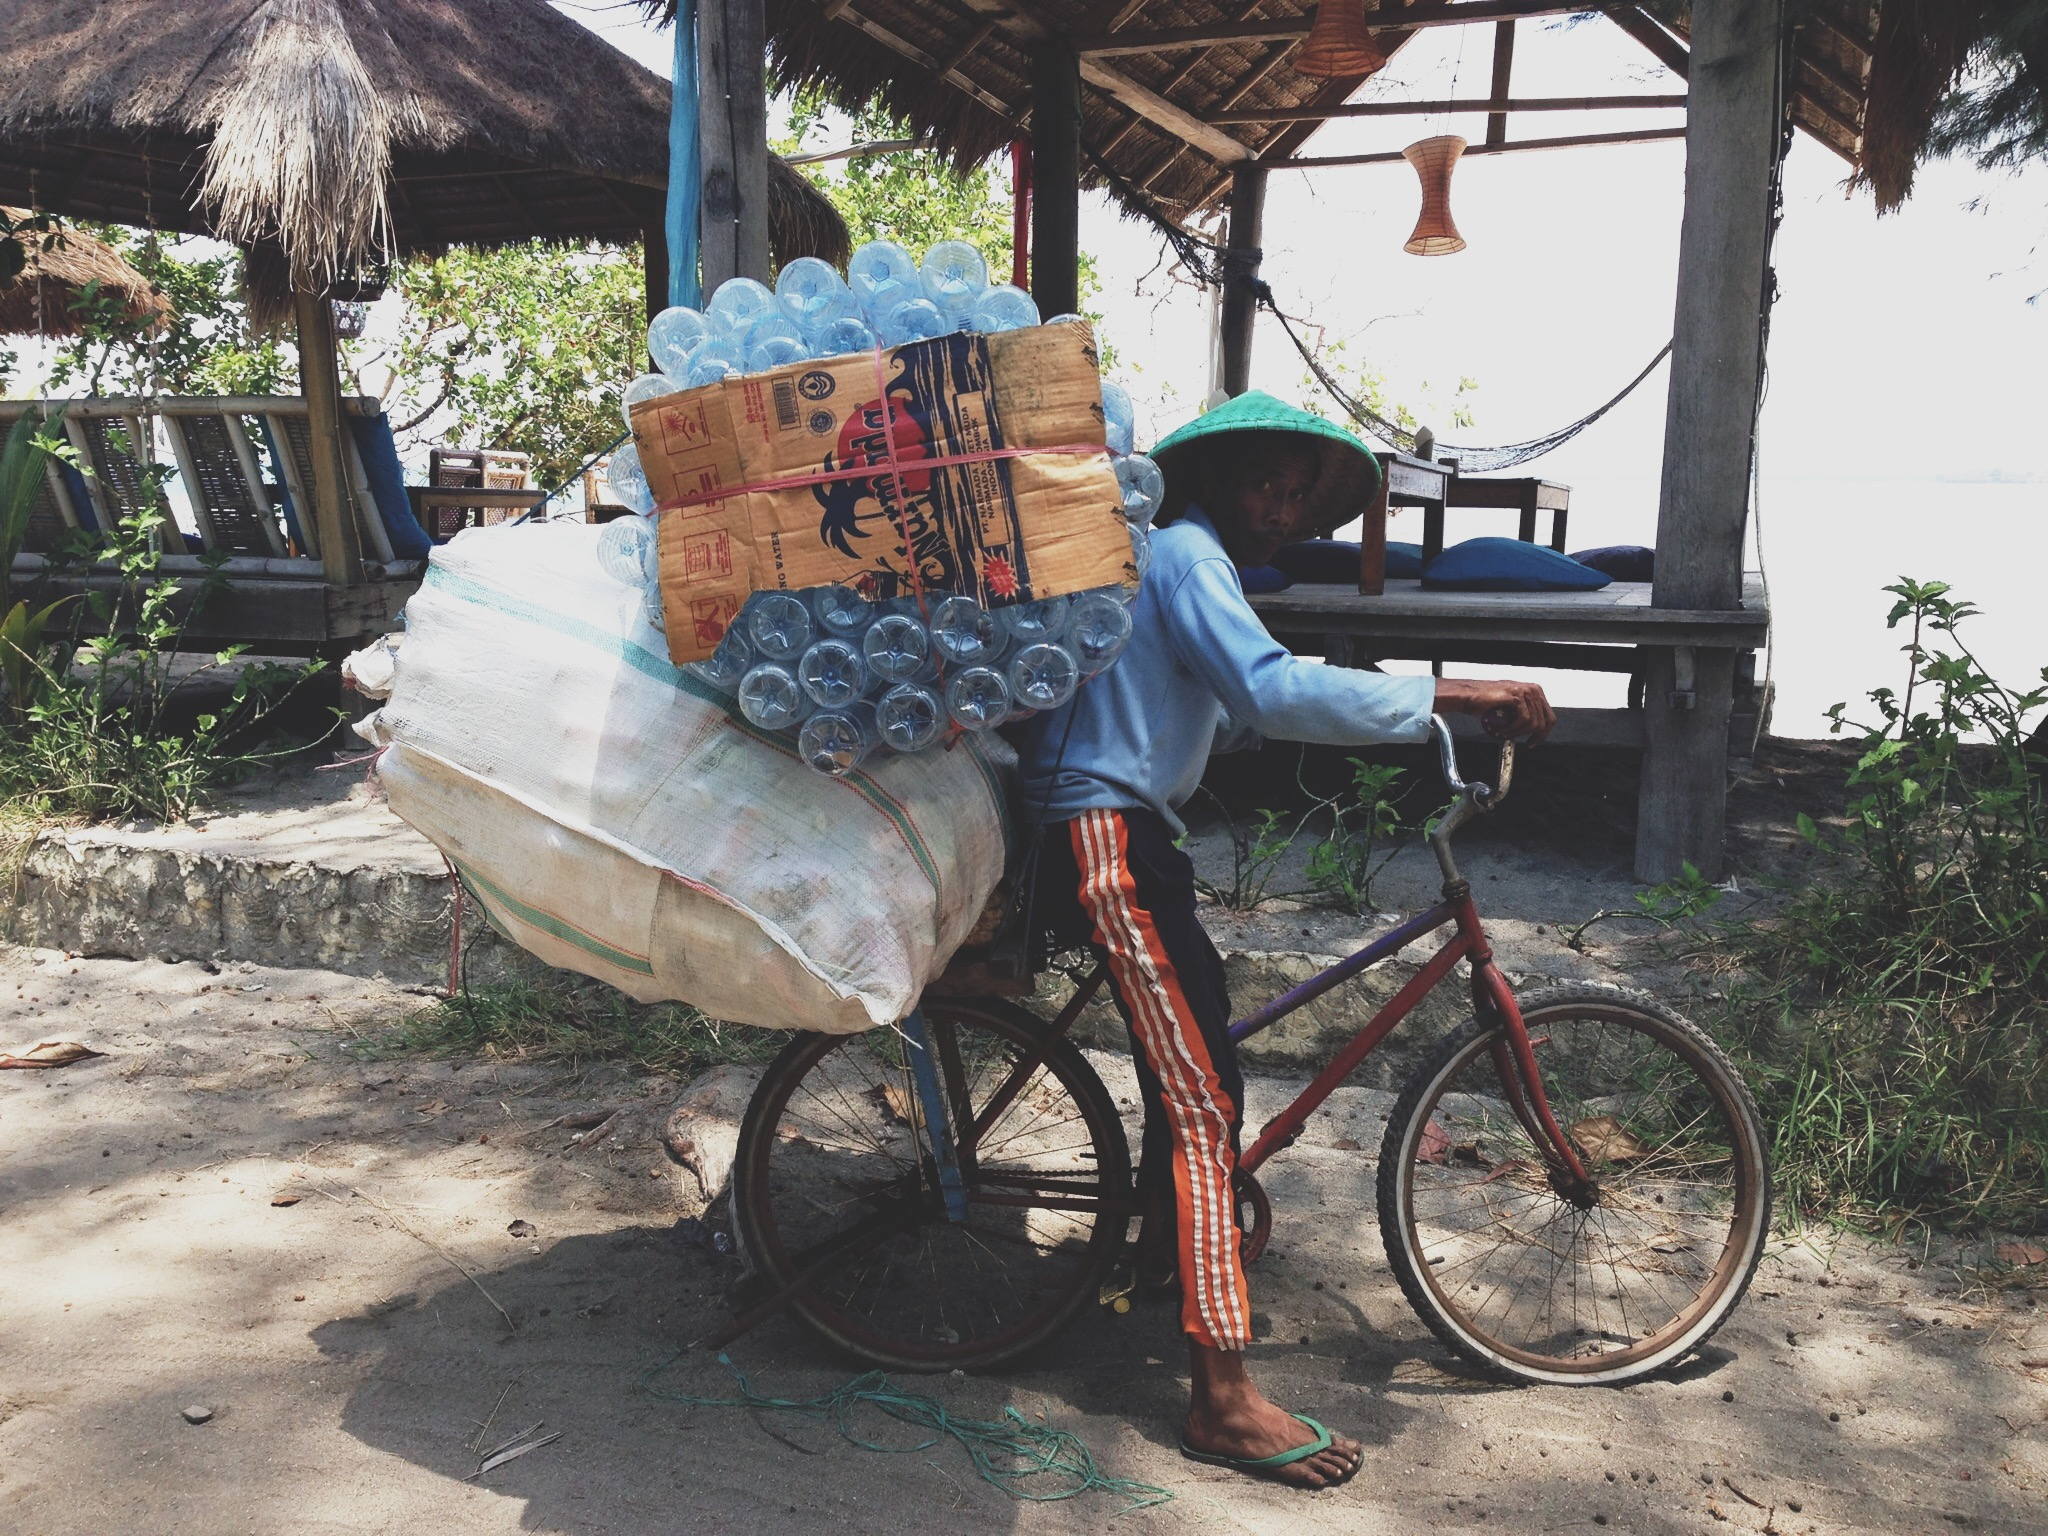 recyclage-gili-air-lombok.JPG